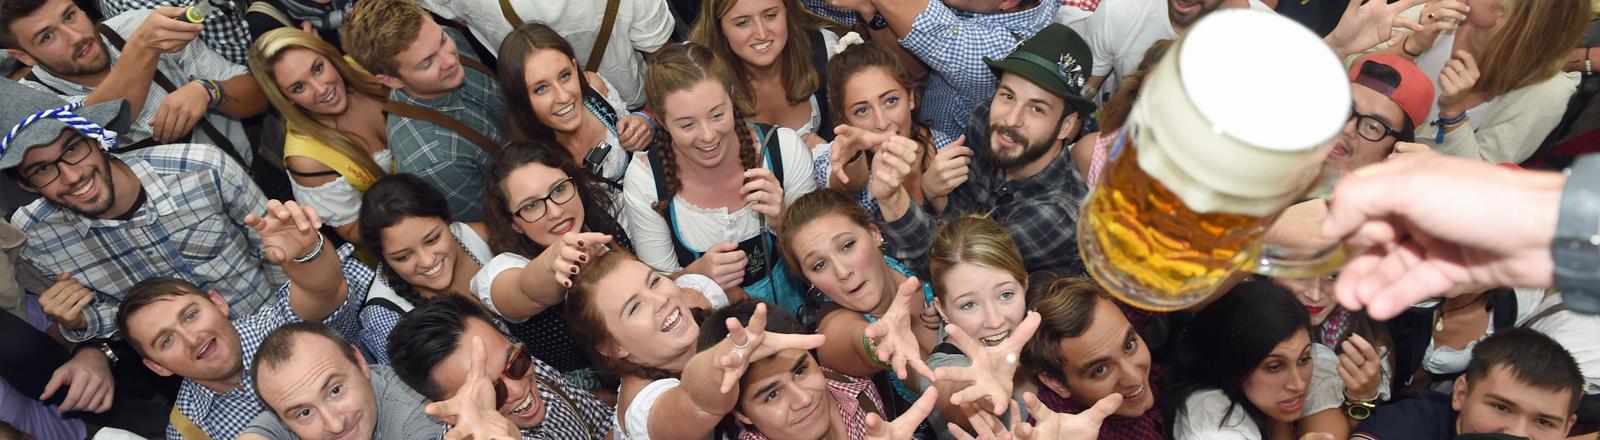 Gäste feiern am 19.09.2015 in München (Bayern) zum Beginn des Oktoberfestes im Hofbräuzelt